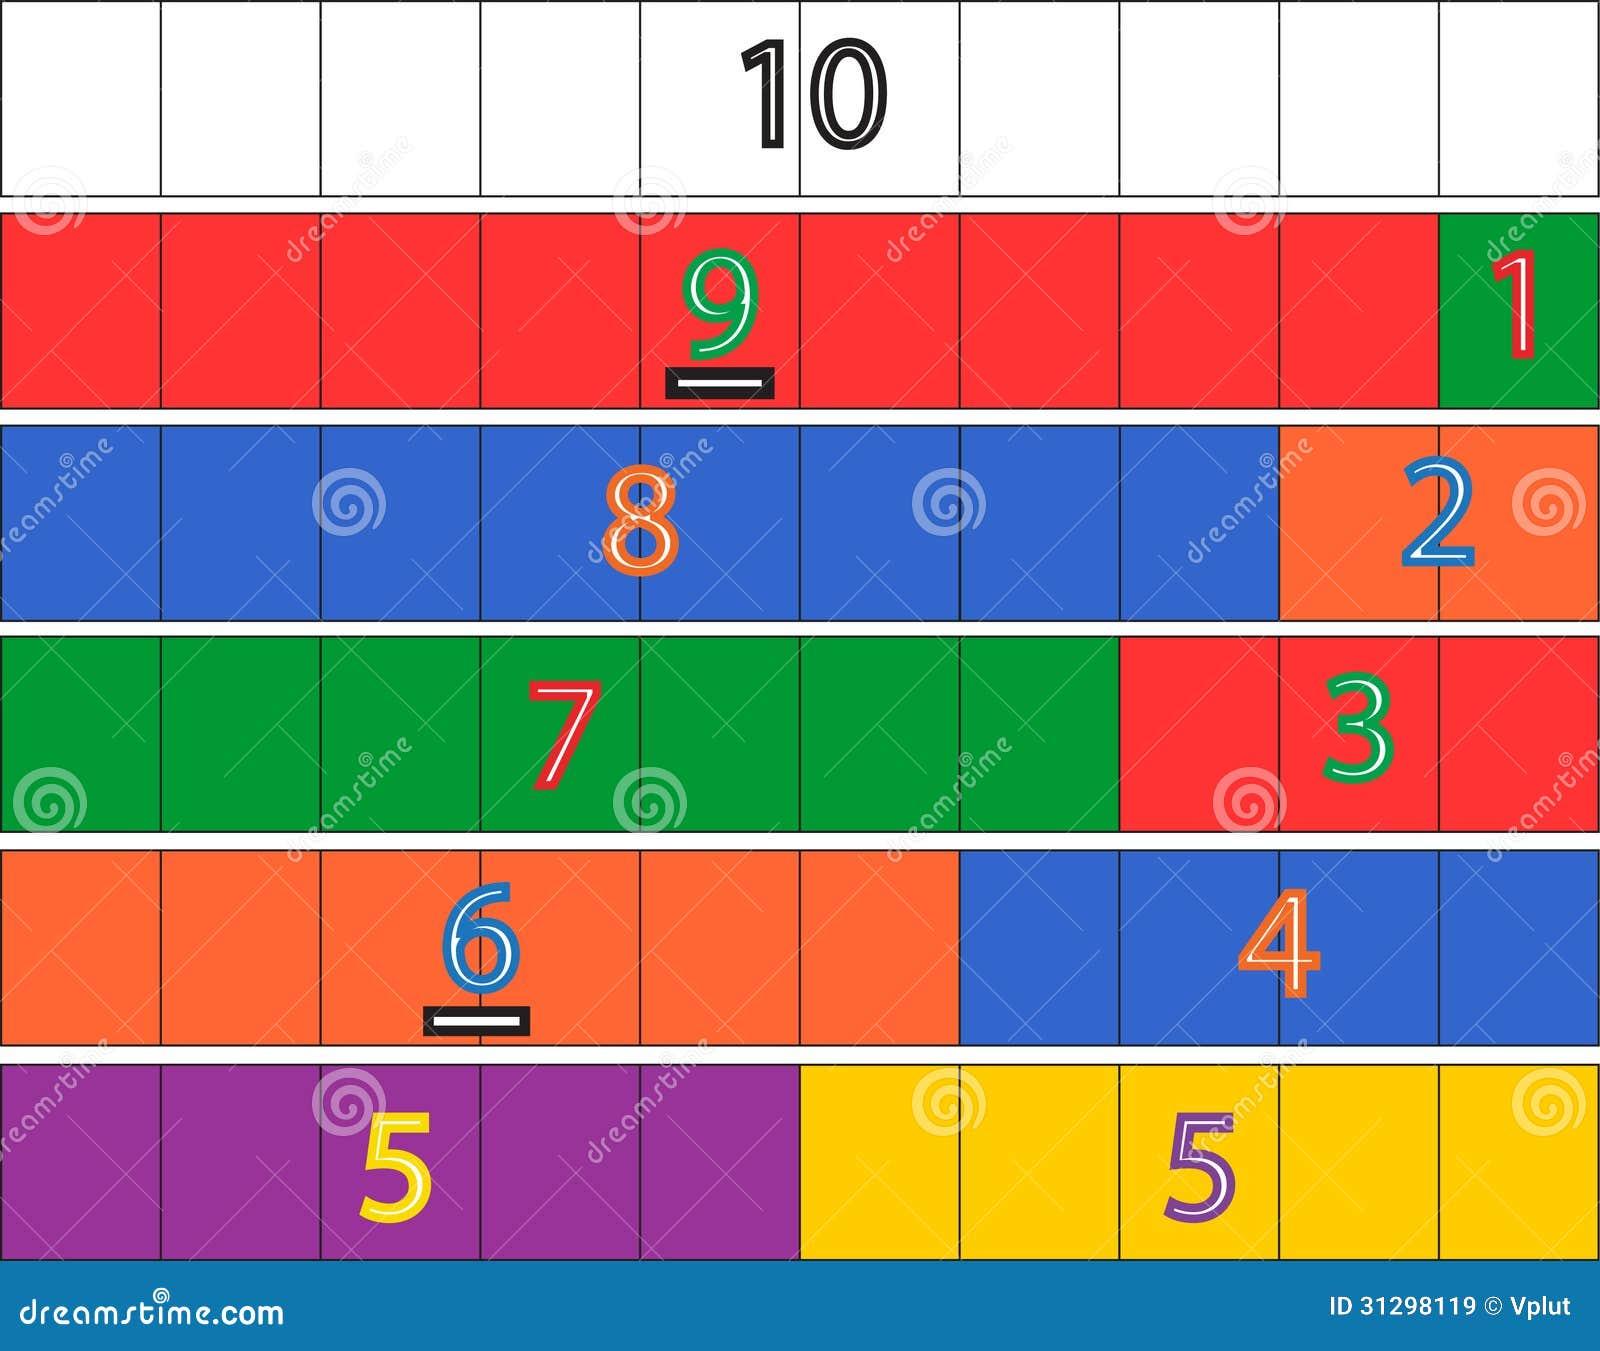 imagens jardim infancia:Kindergarten Classroom Math Games